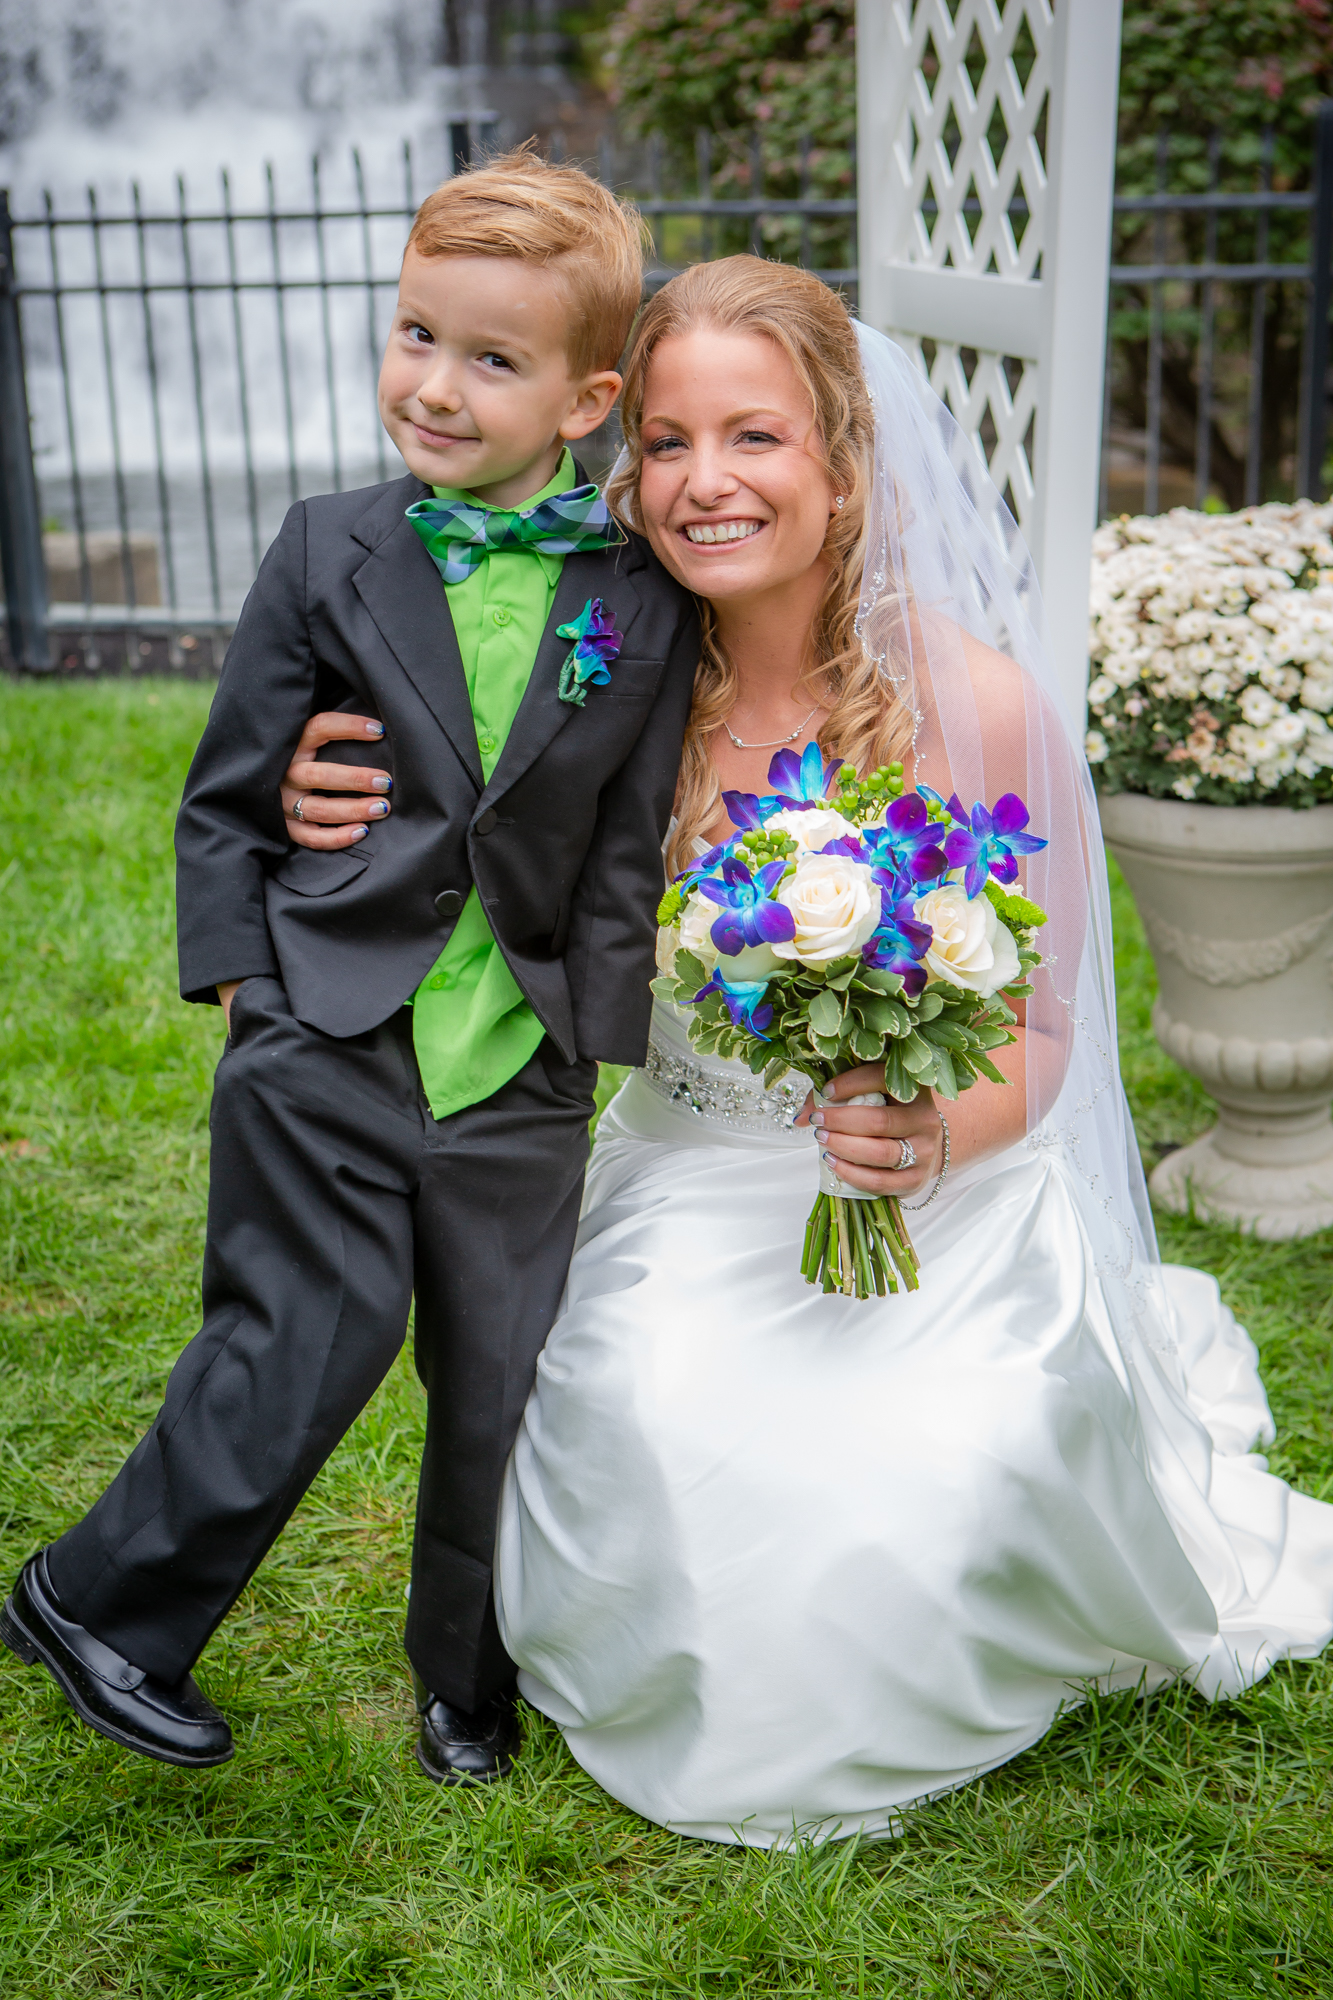 Raddison-Hotel-Corning-NY-Wedding-4000.jpg